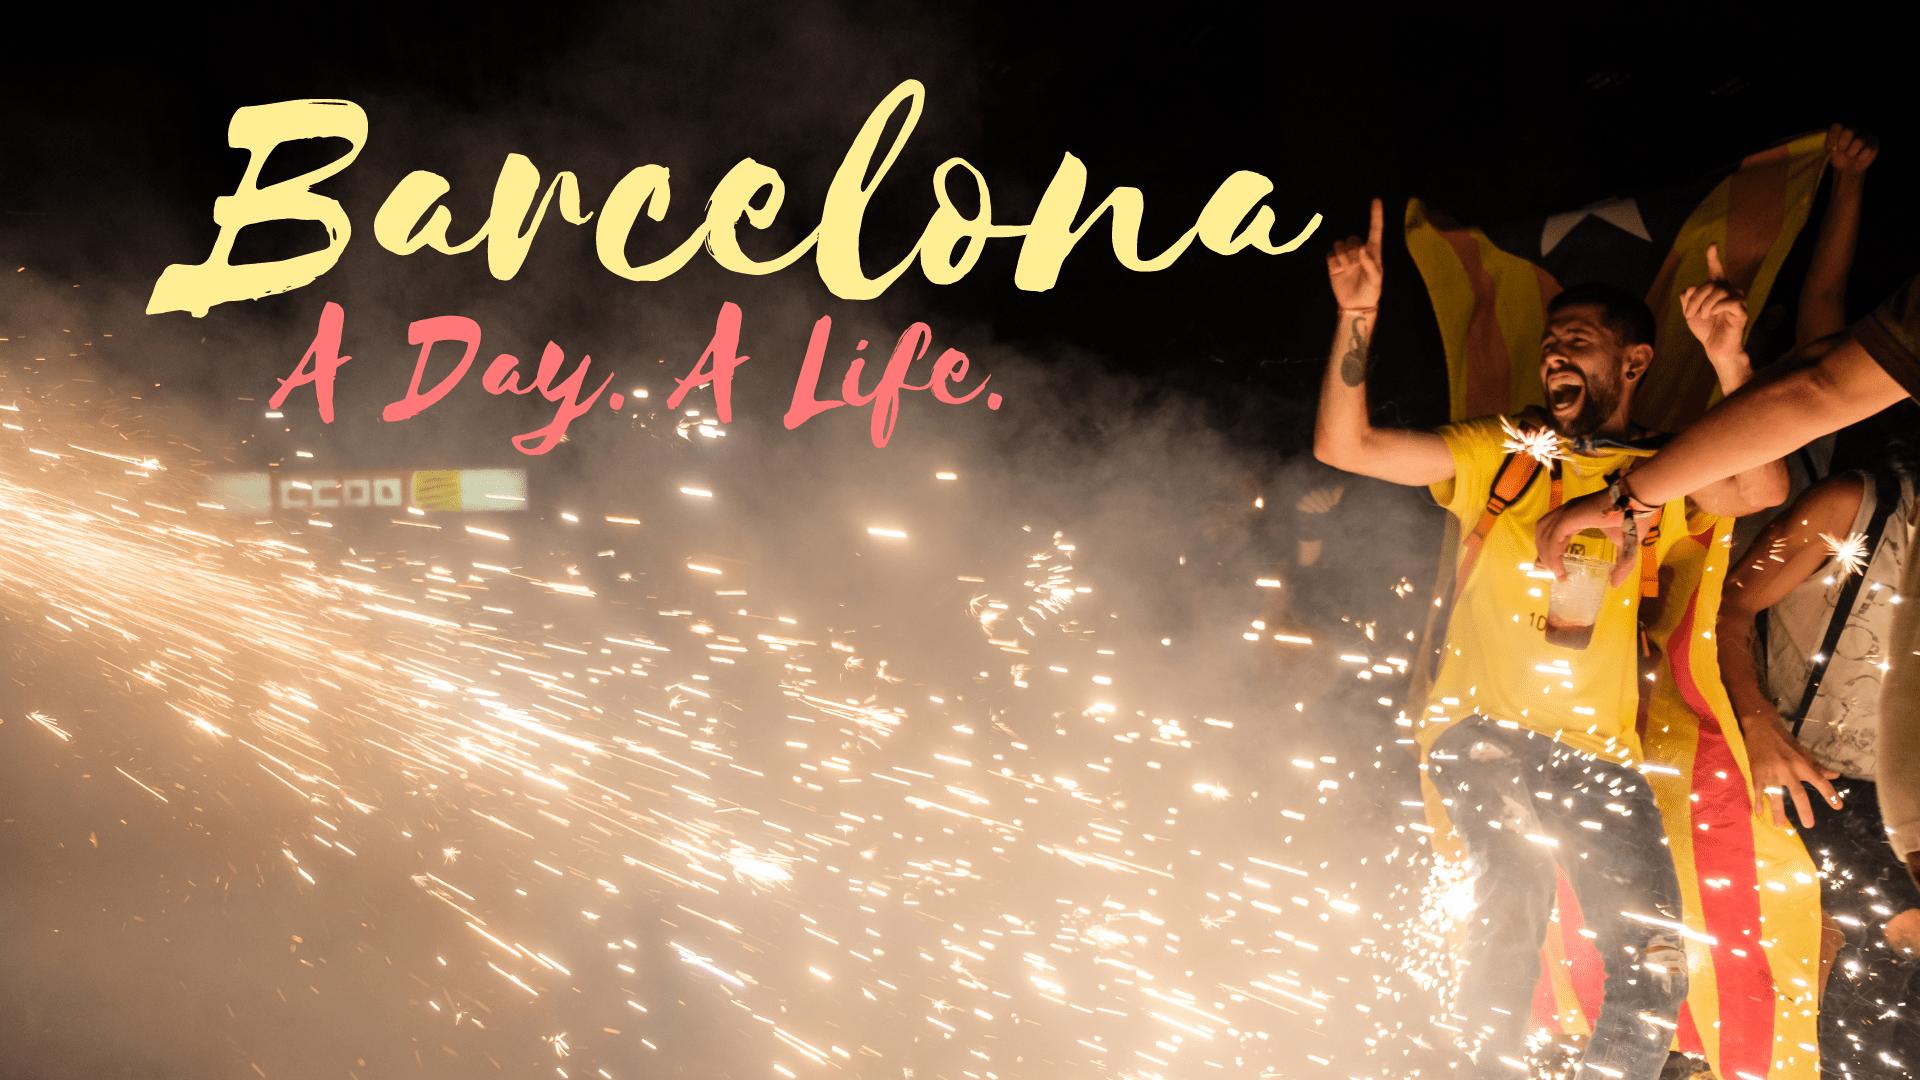 Barcelona. A Day. A Life. (A Ben Holbrook Film)